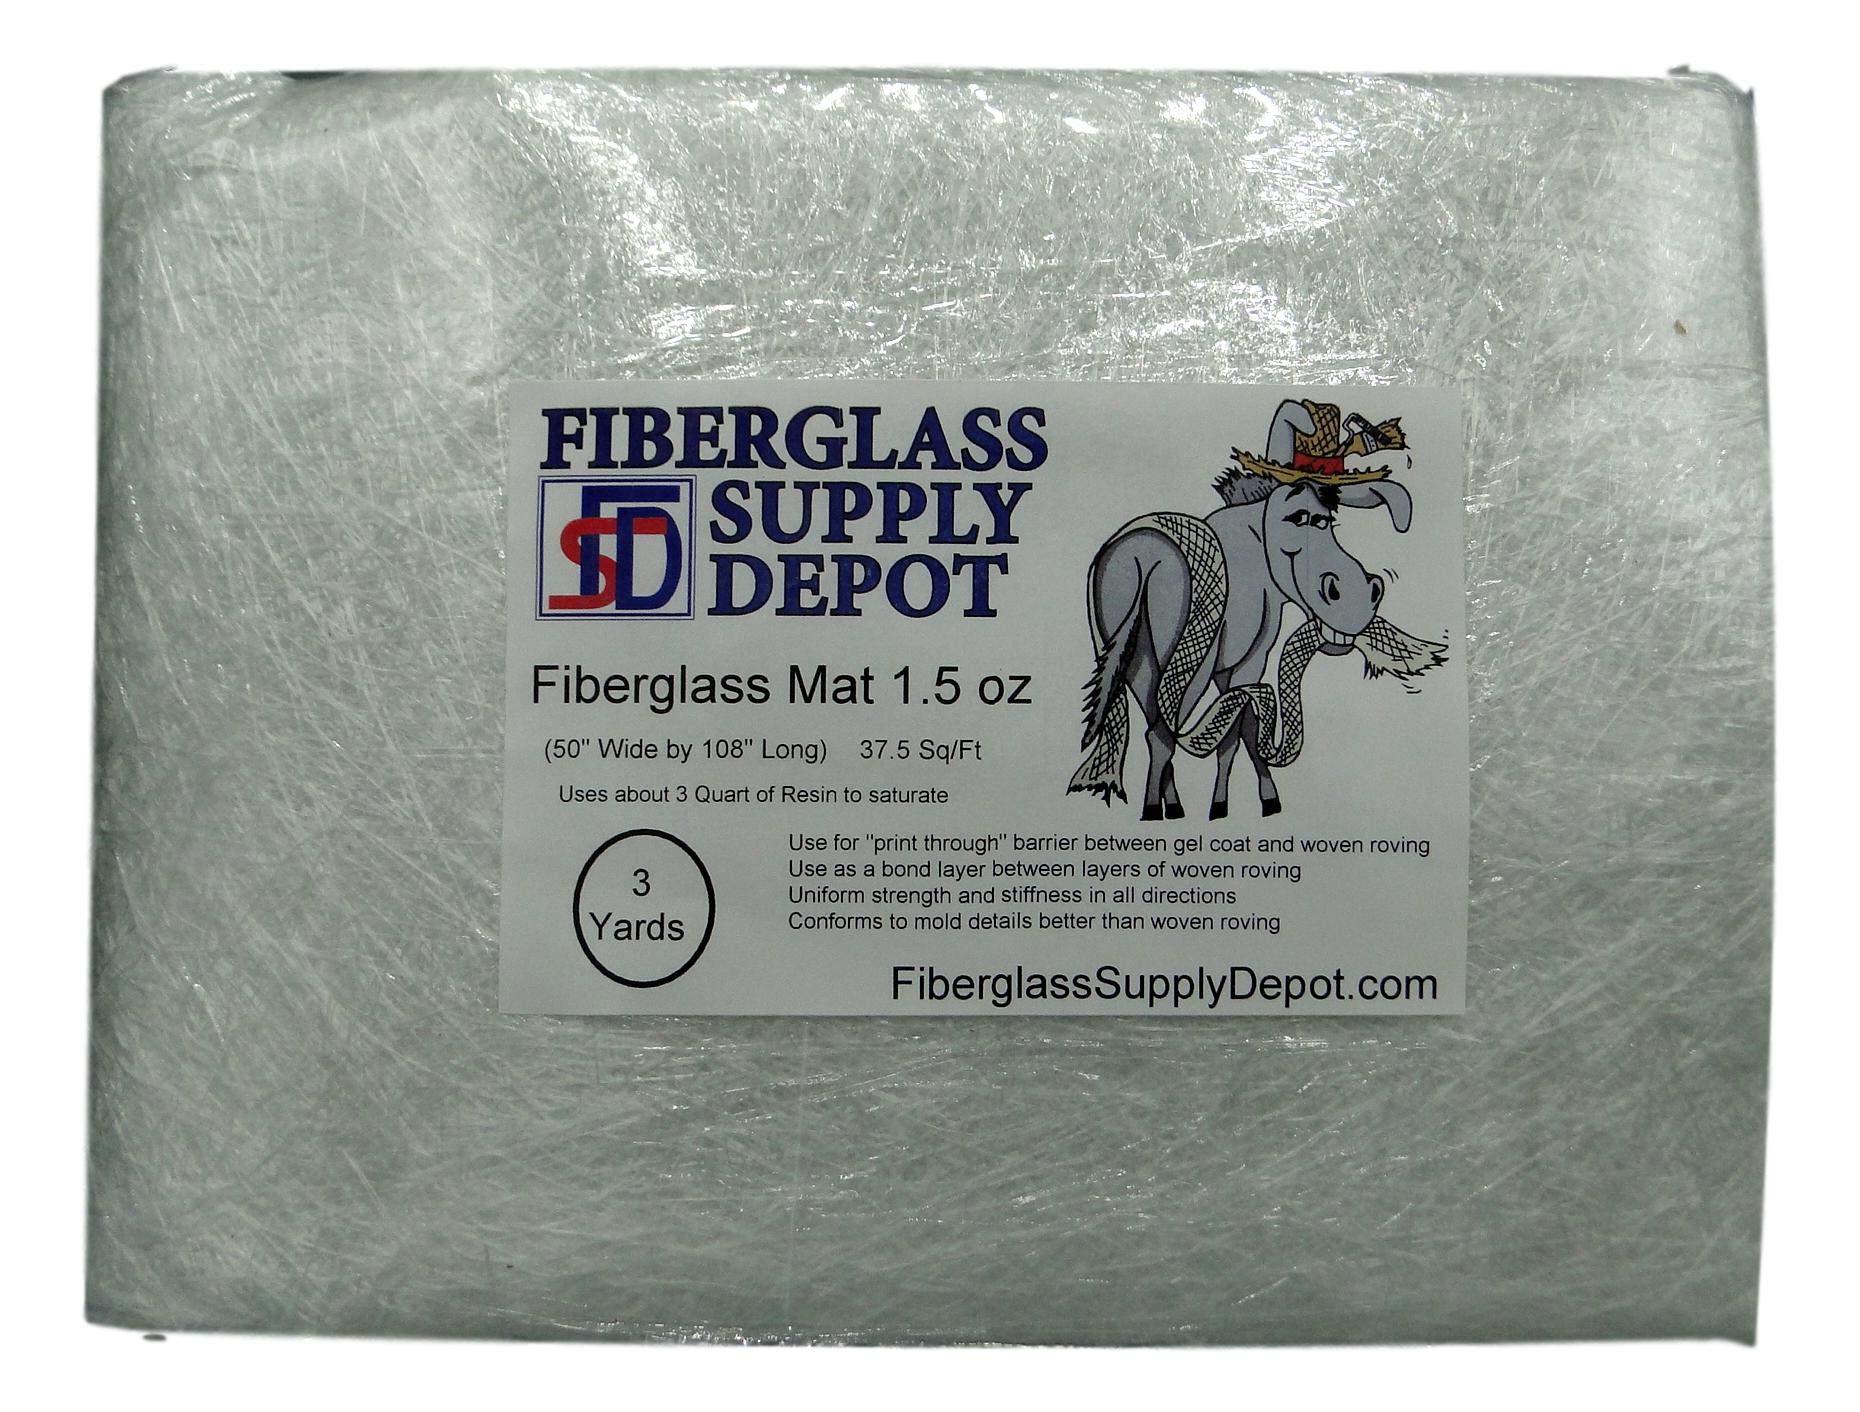 Fiberglass Mat - 1.5 oz - 3 Yards - CSM - Chopped Strand Mat by CTG